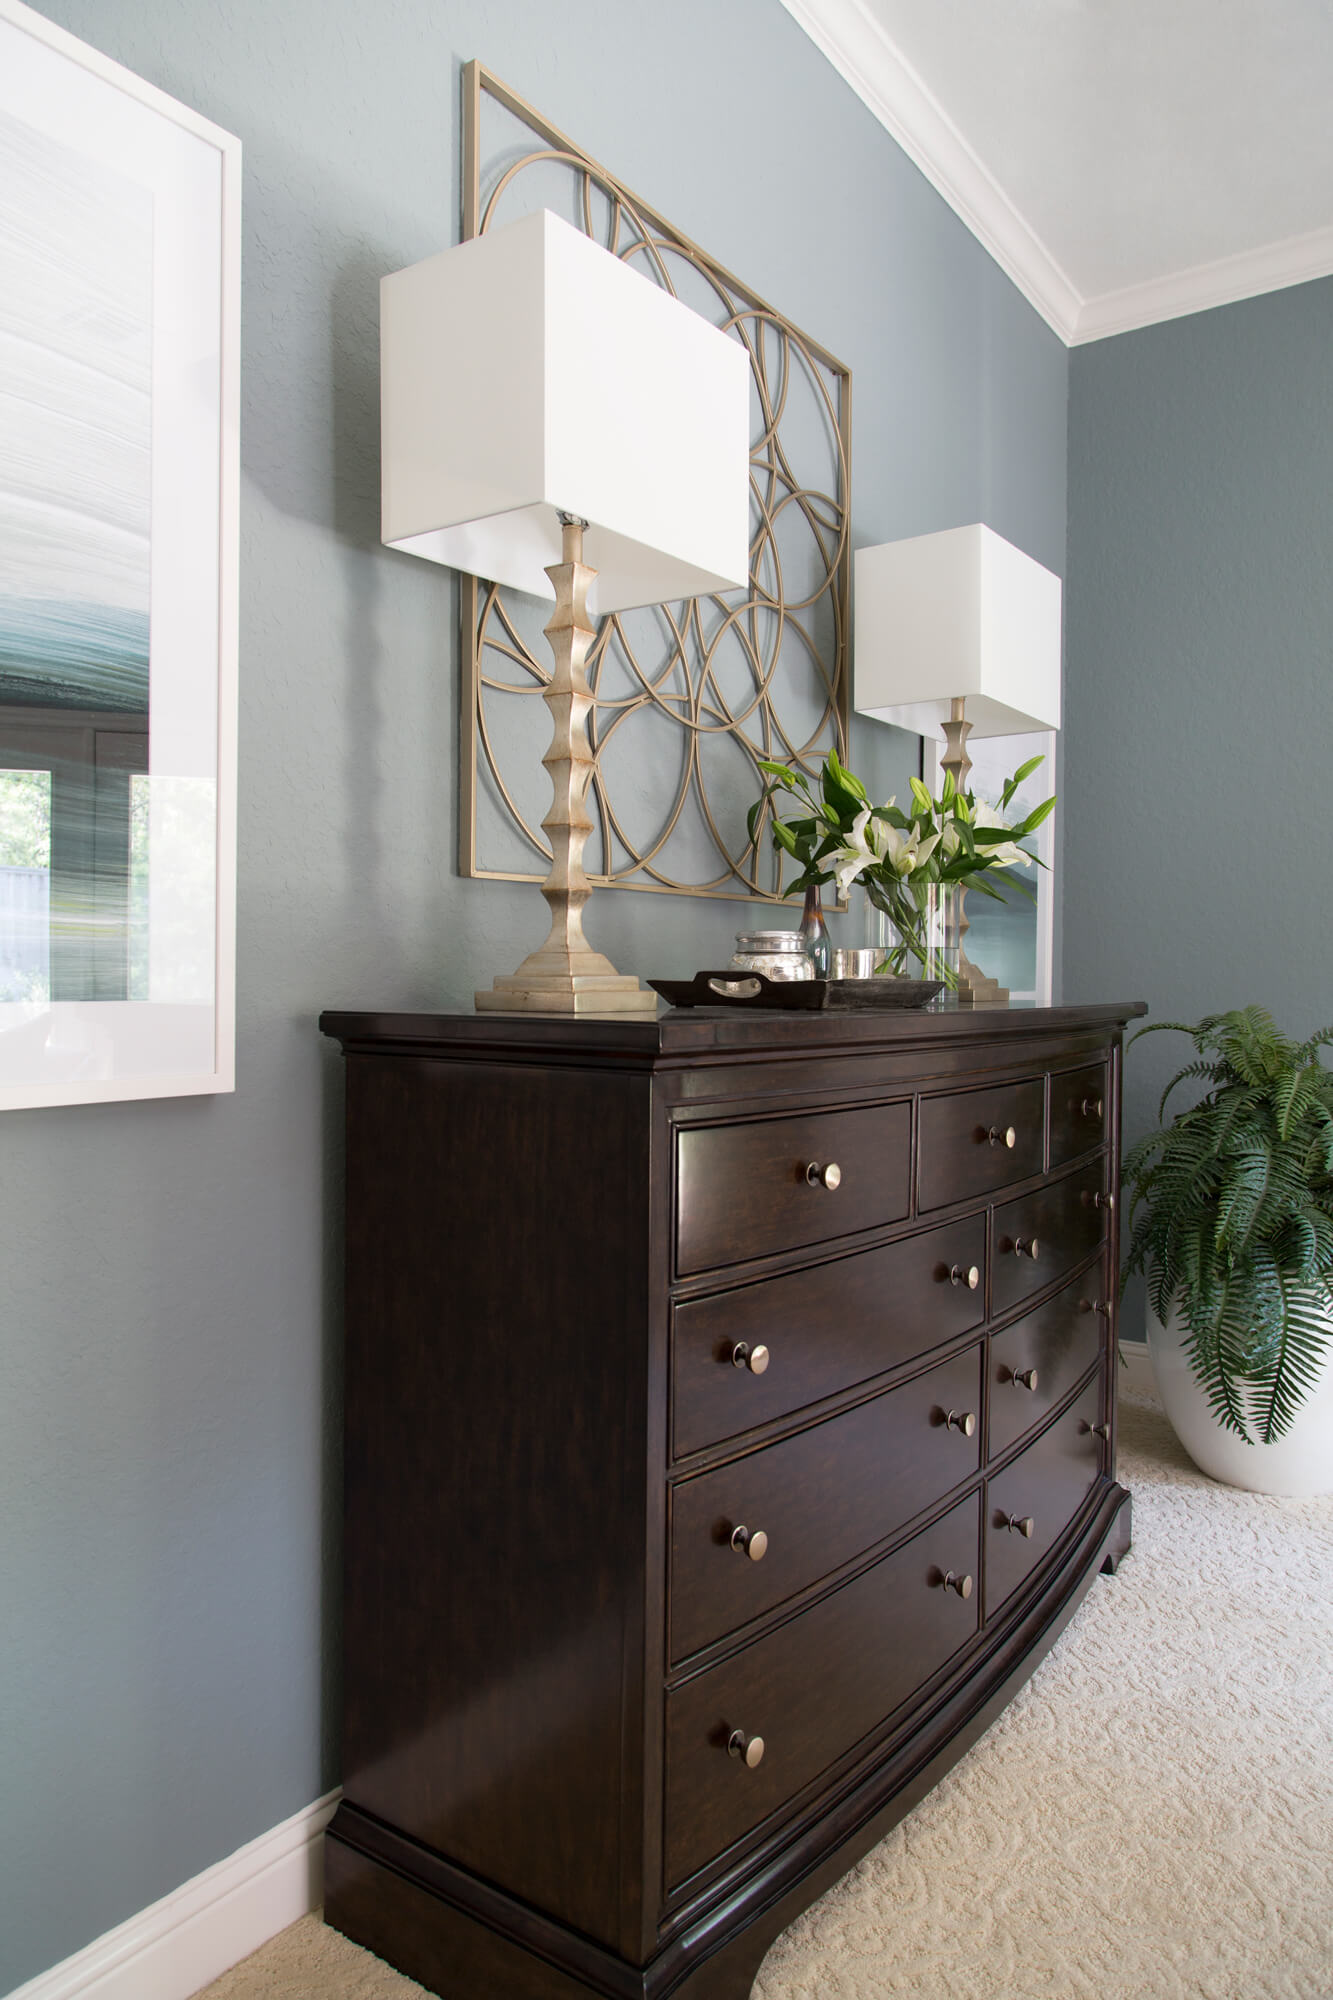 Bedroom dresser with lamps   Interior Designer: Carla Aston